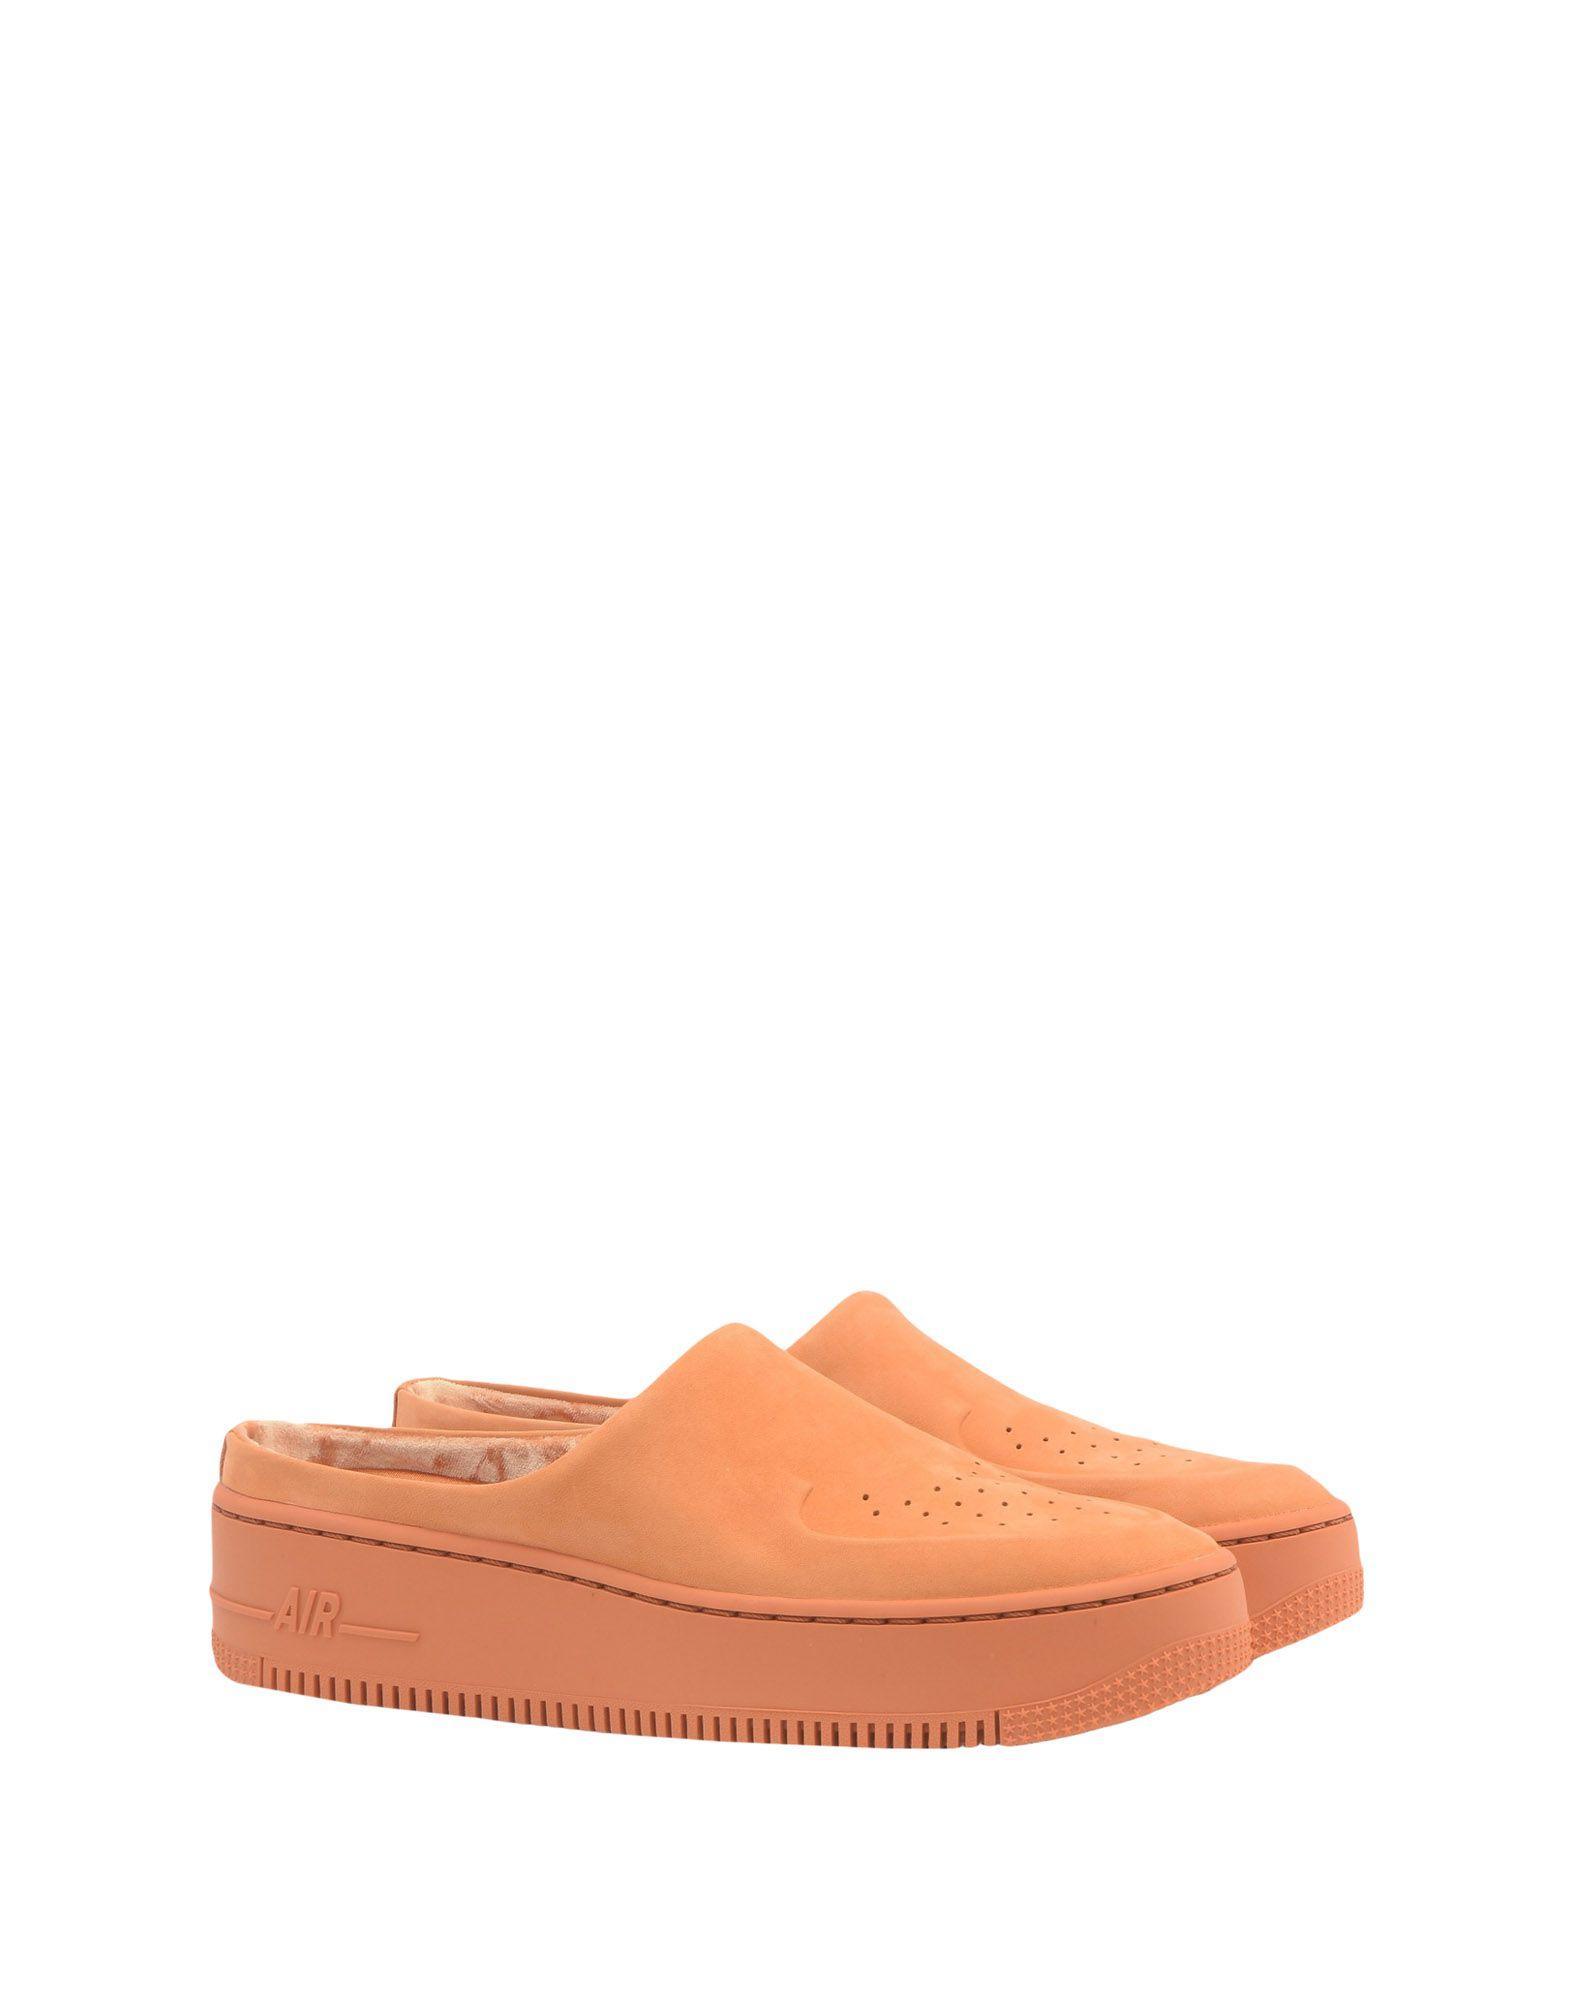 Nike Leather Mules in Orange